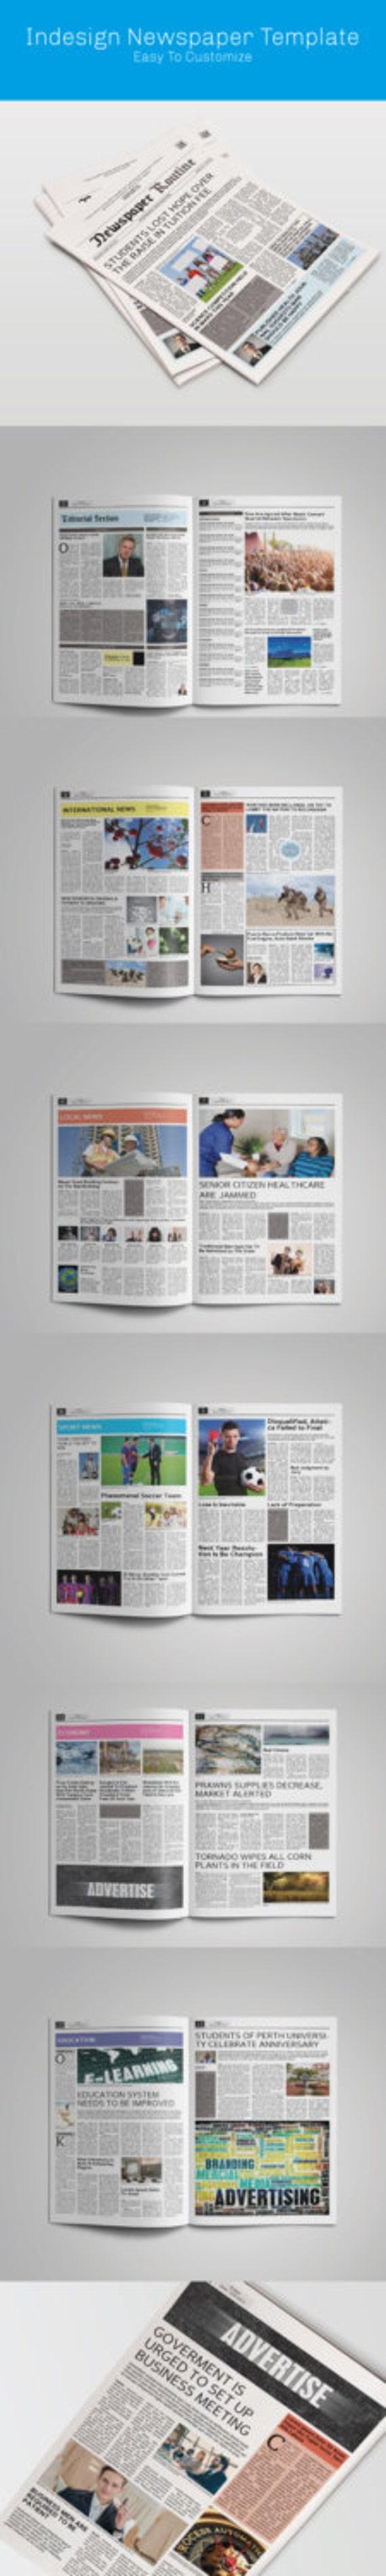 Newspaper Template Tabloid Size